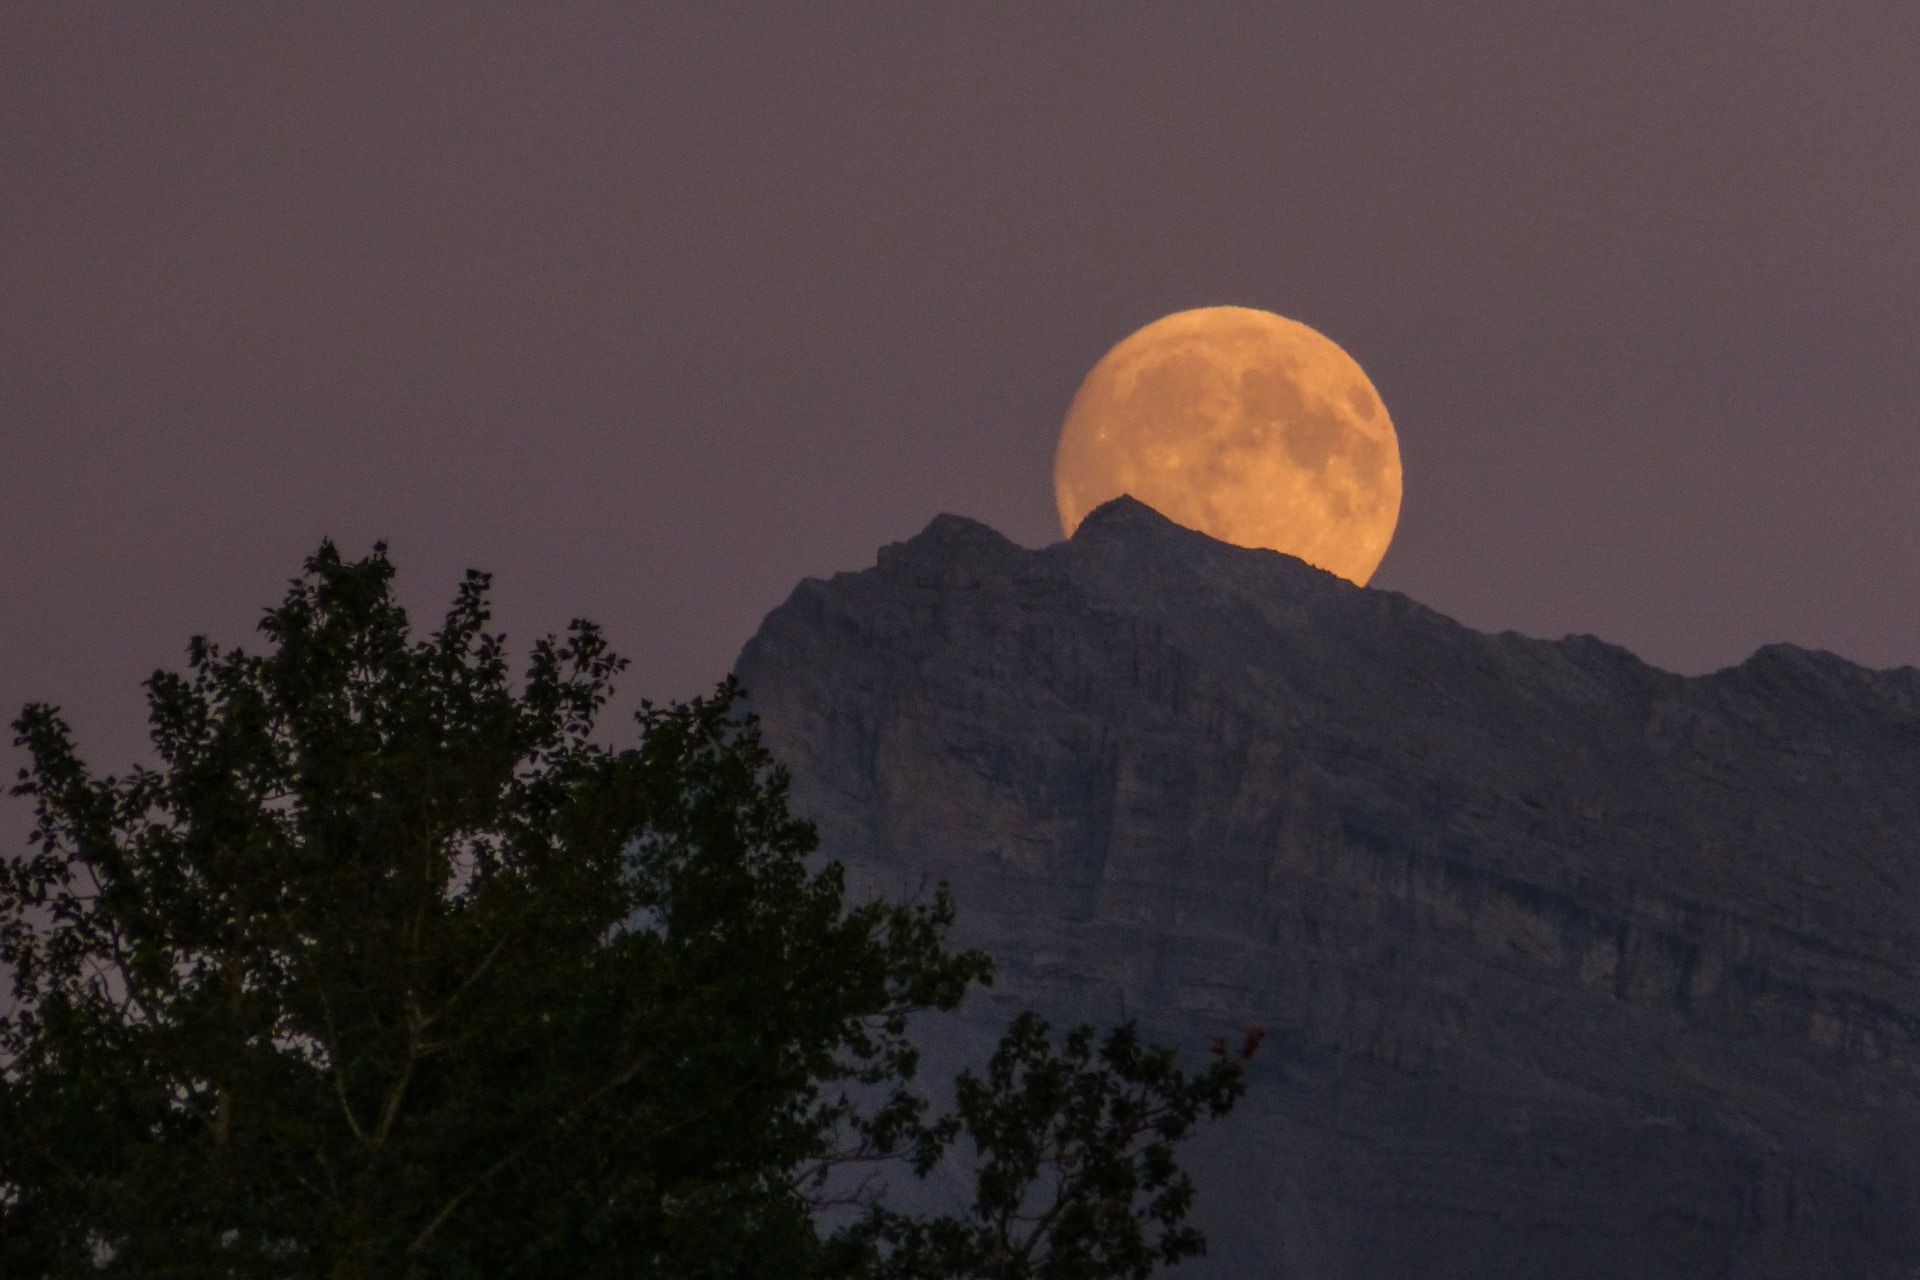 moon over the horizon